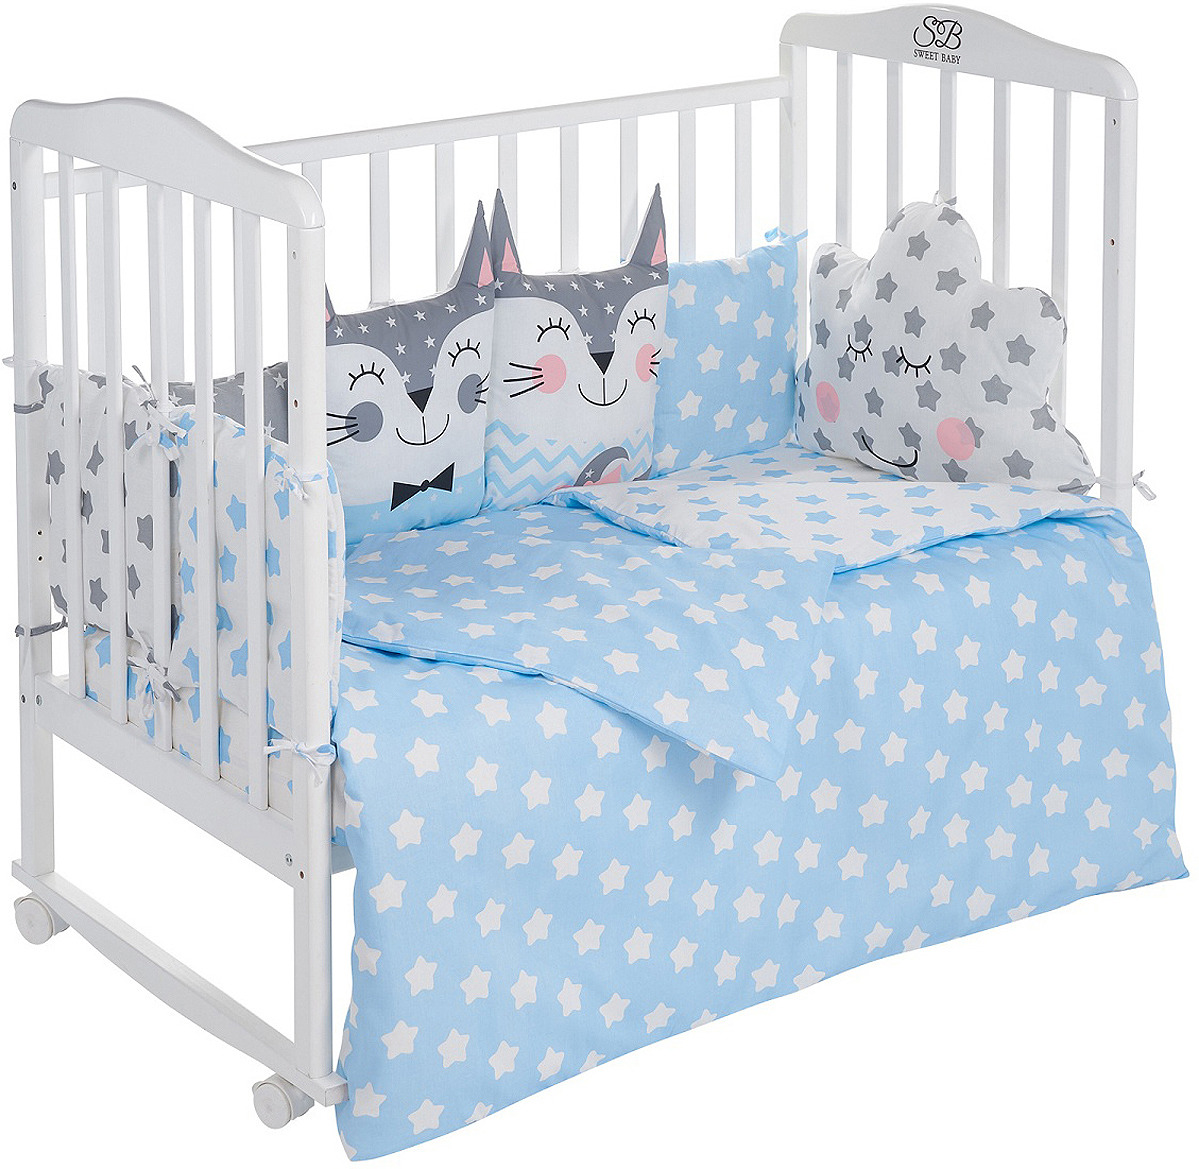 Комплект в кроватку Sweet Baby Gioia Blu, 423284, голубой, 4 предмета